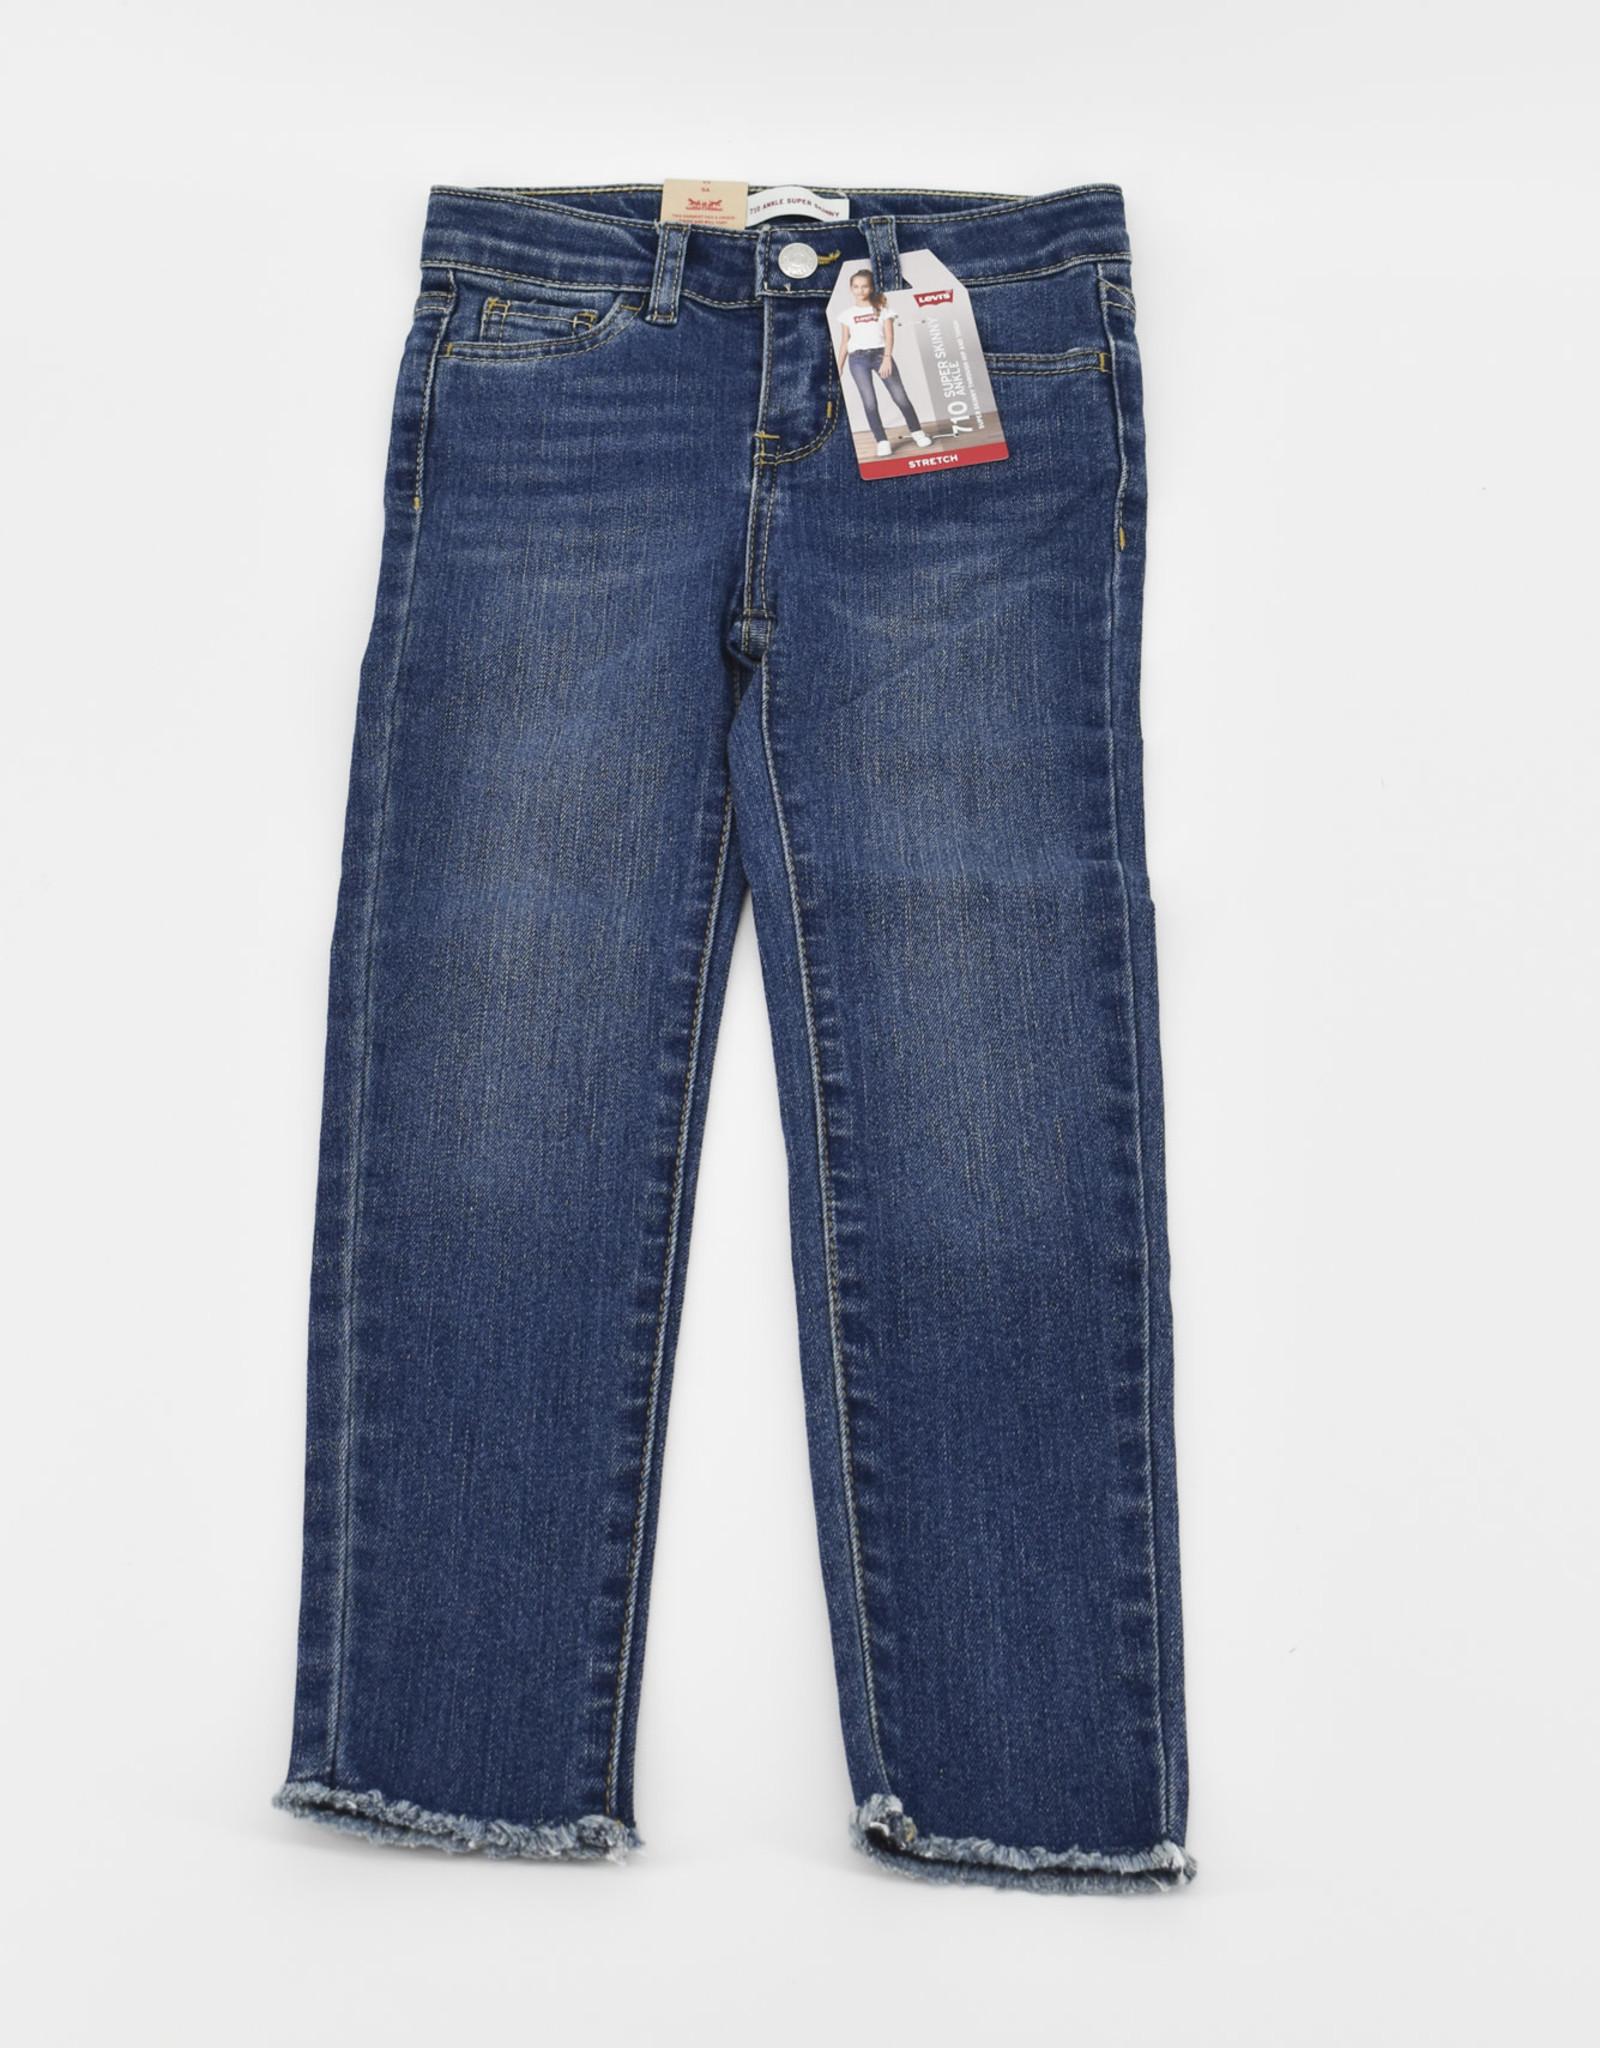 LEVI'S Lvg 710 Skinny Ankle Jeans Sao Paulo